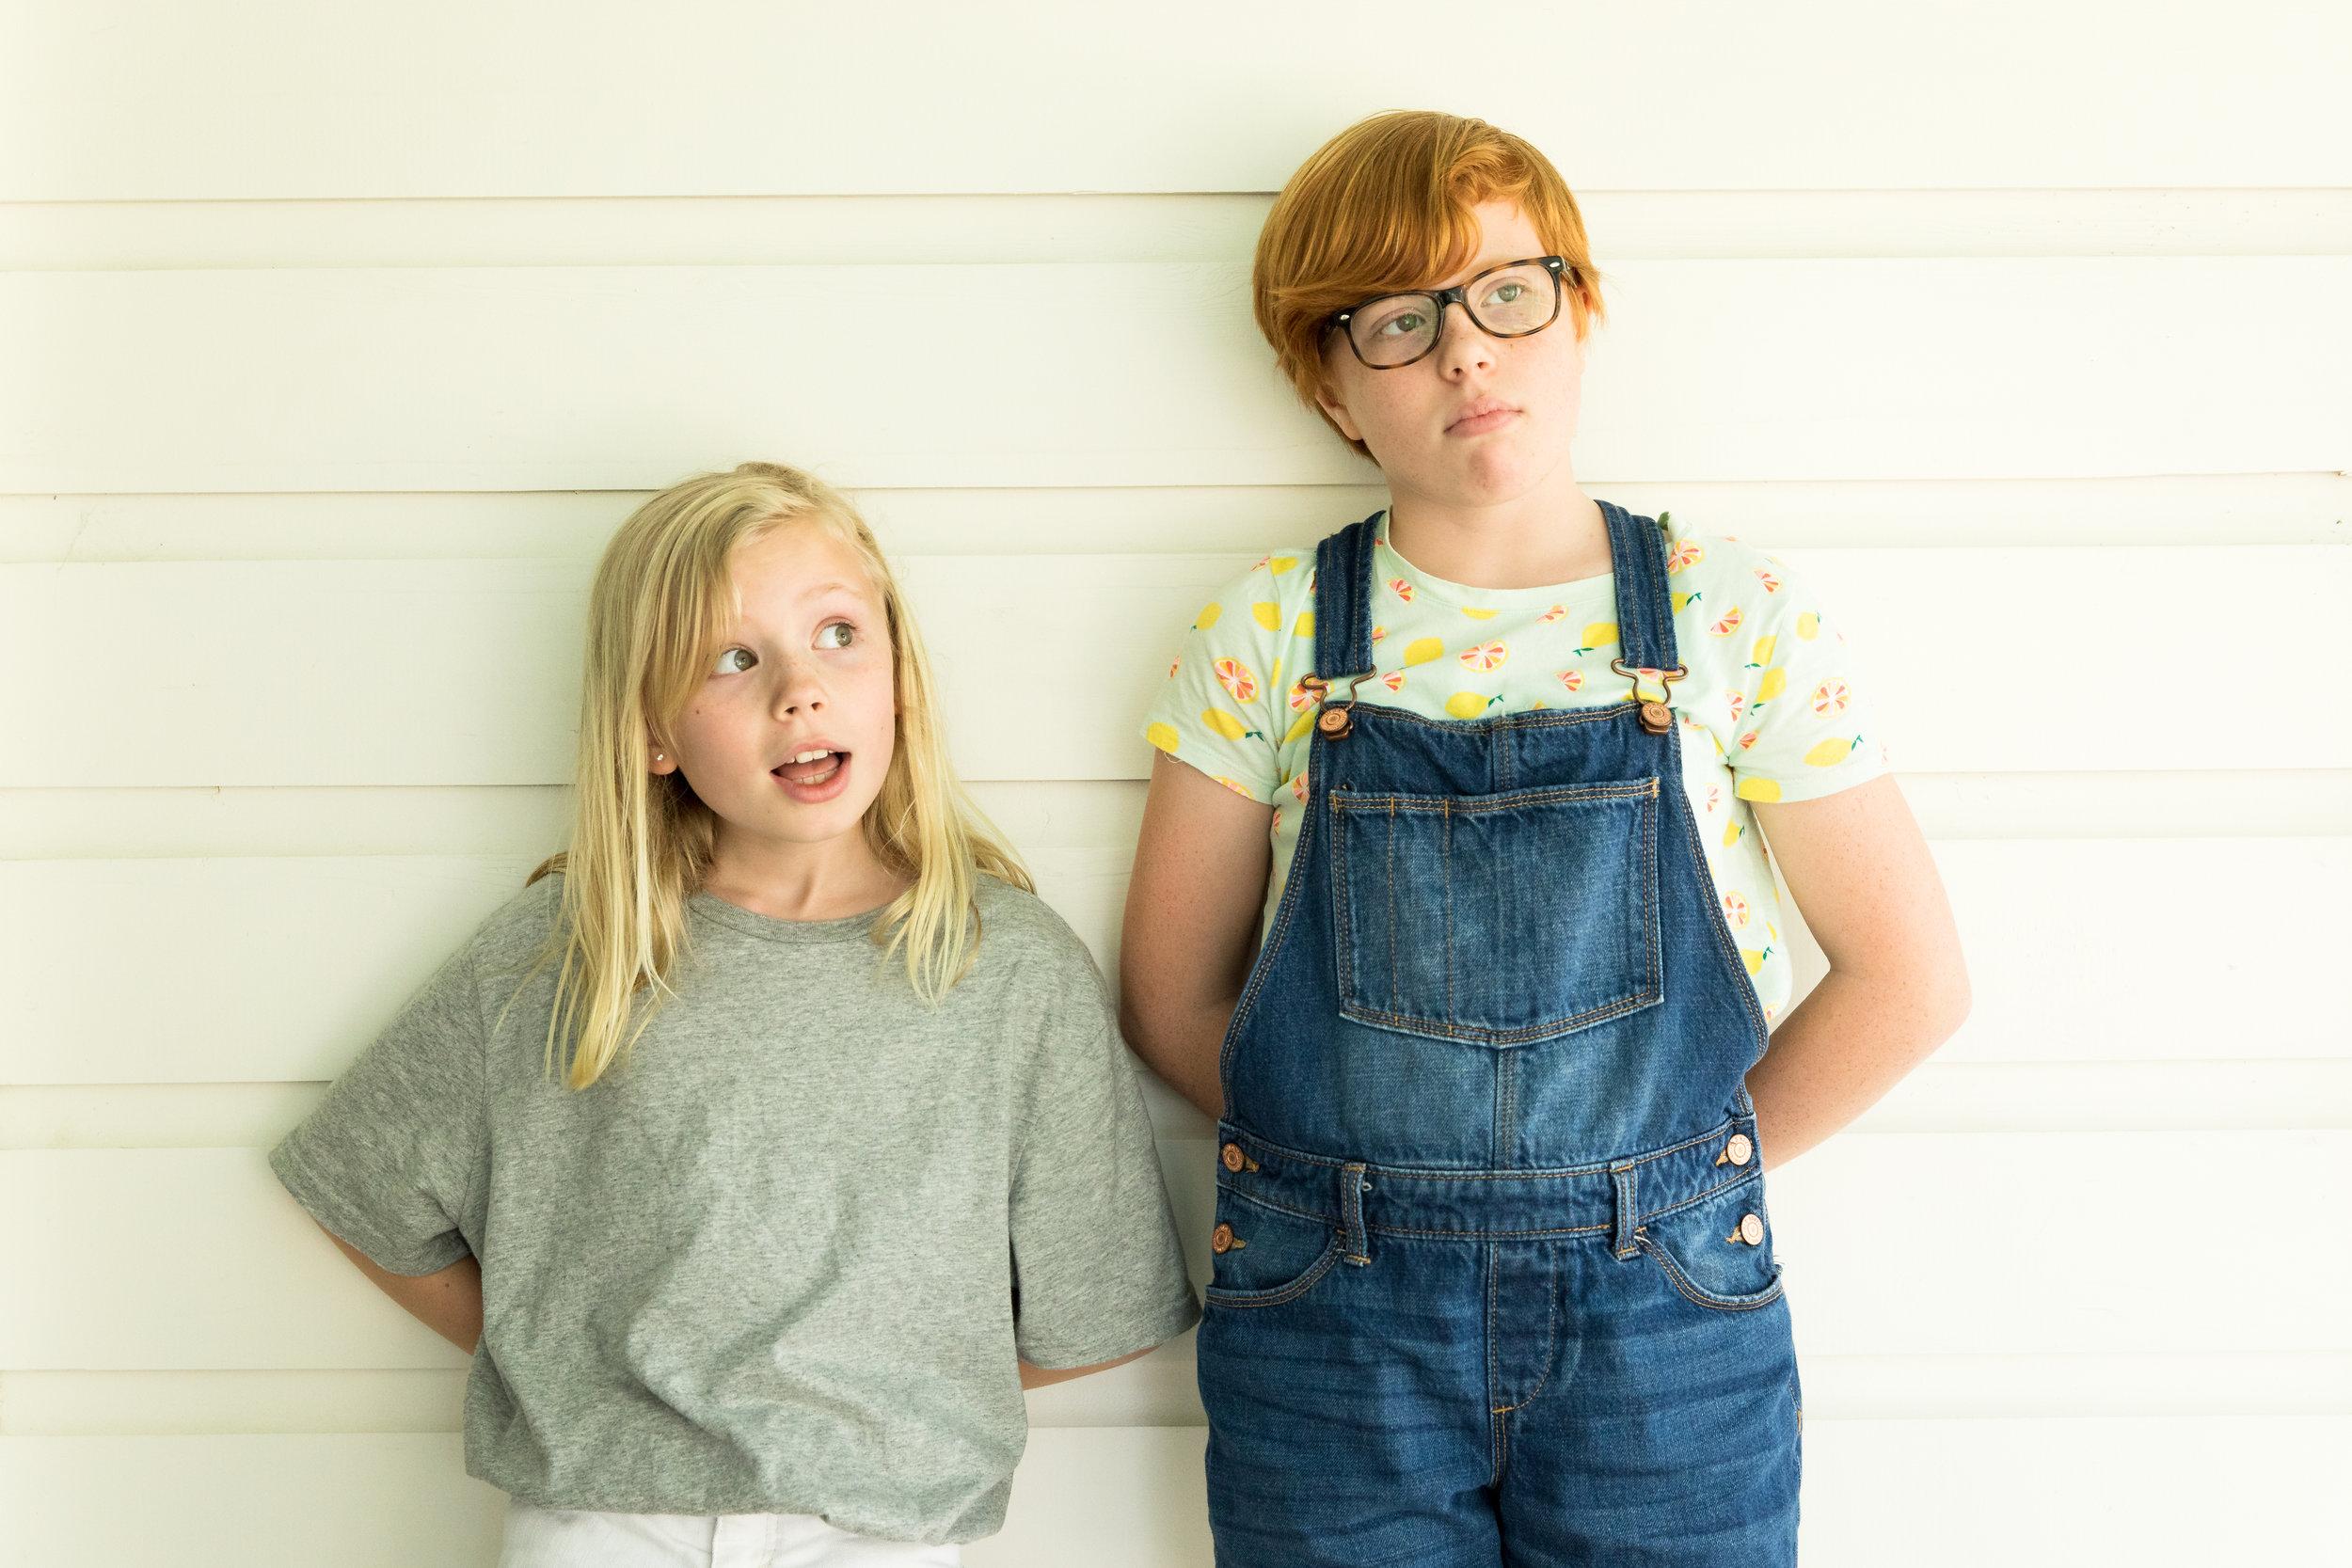 #siblingrevelryproject #inCOLOR